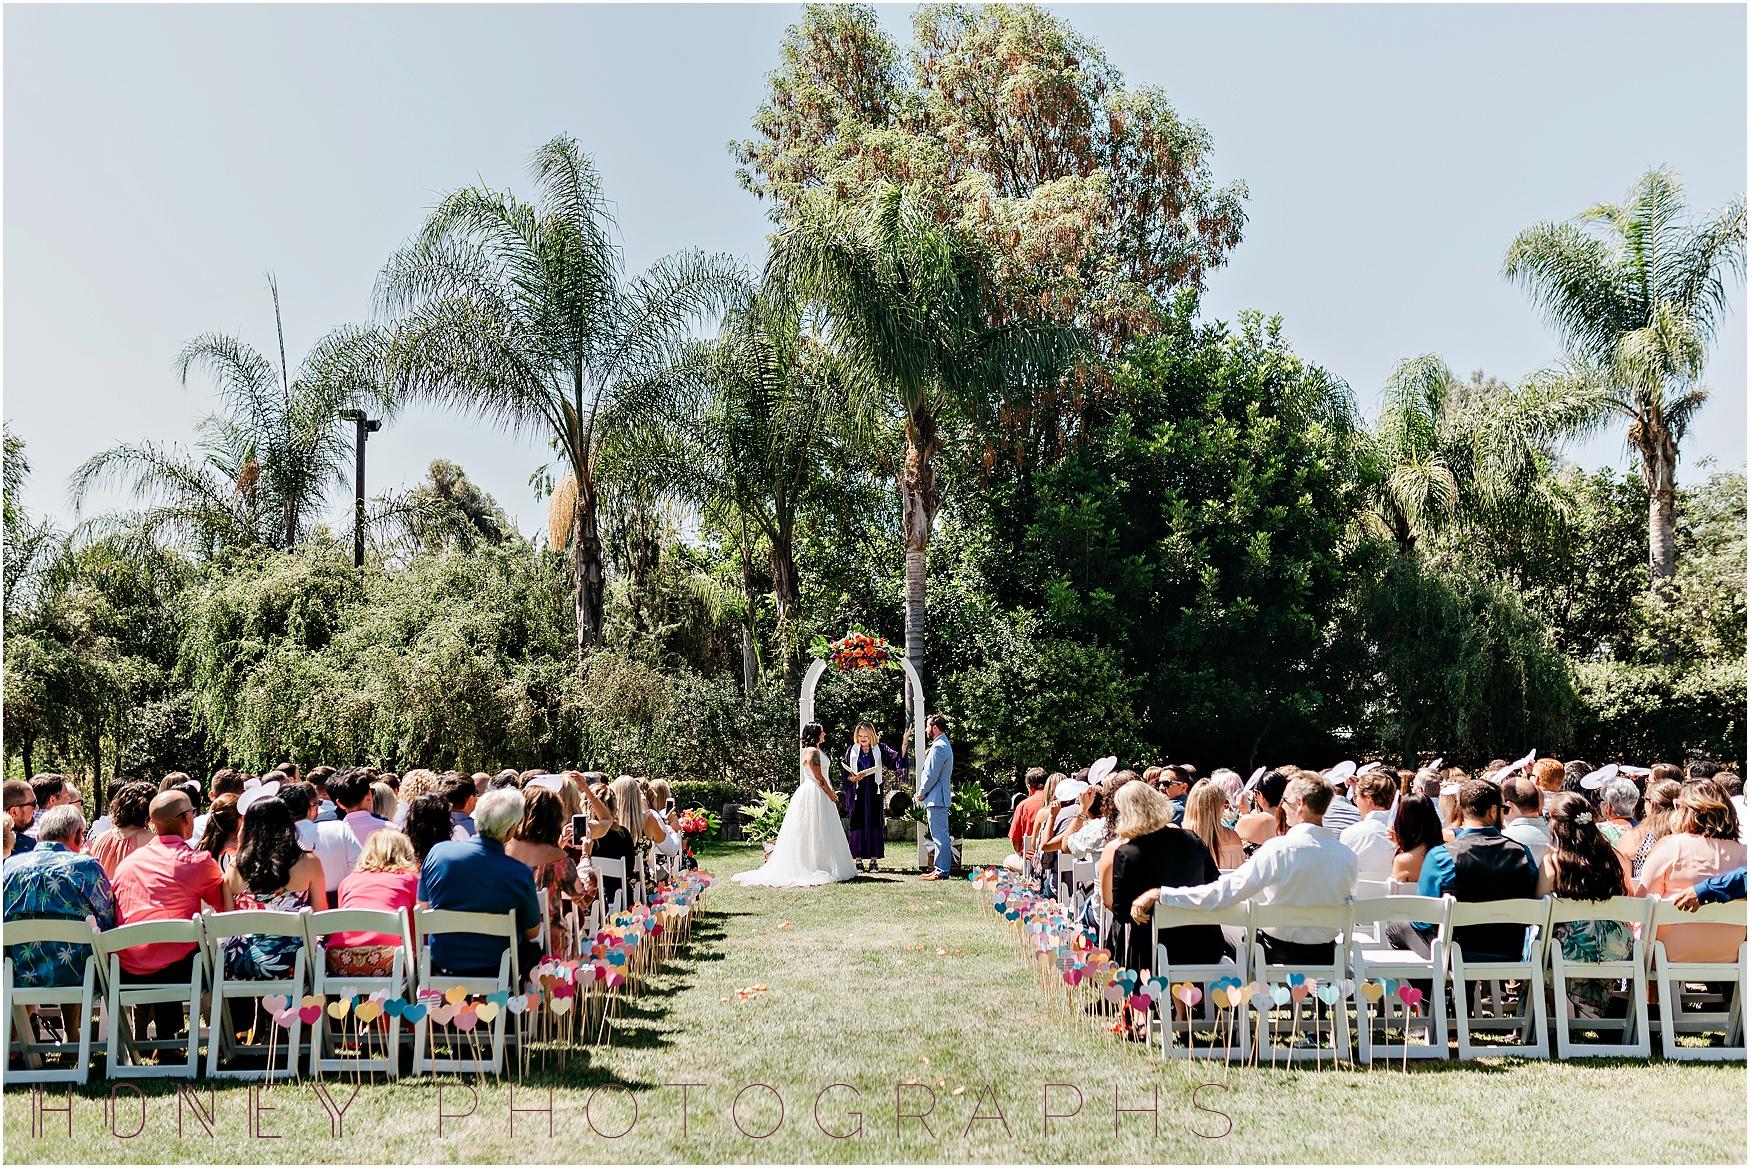 colorful_ecclectic_vibrant_vista_rainbow_quirky_wedding017.jpg